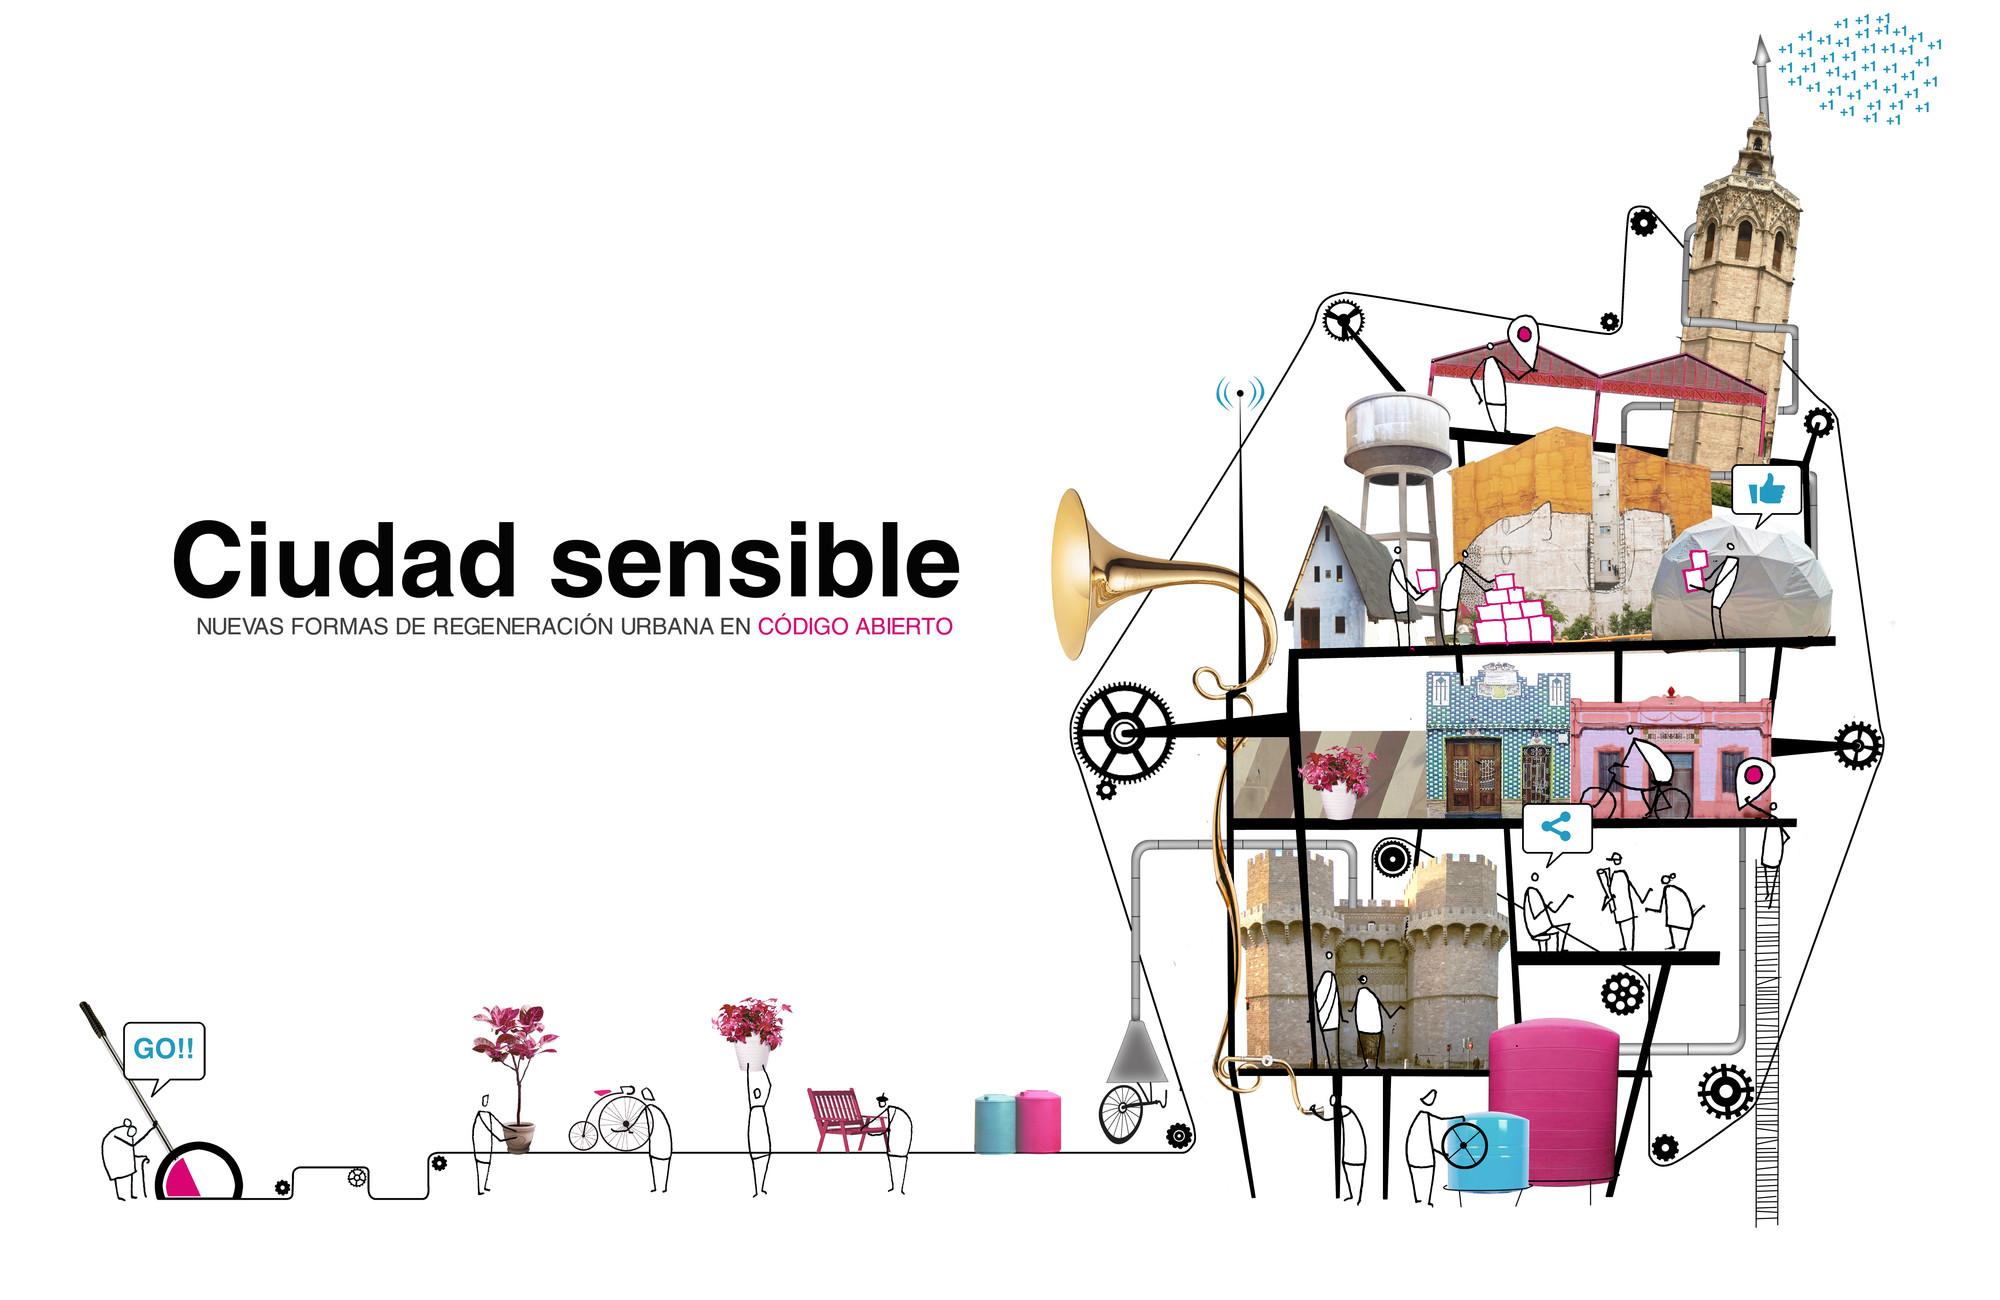 #CiudadSensible 2014 / Valencia, España, Courtesy of Carpe Via